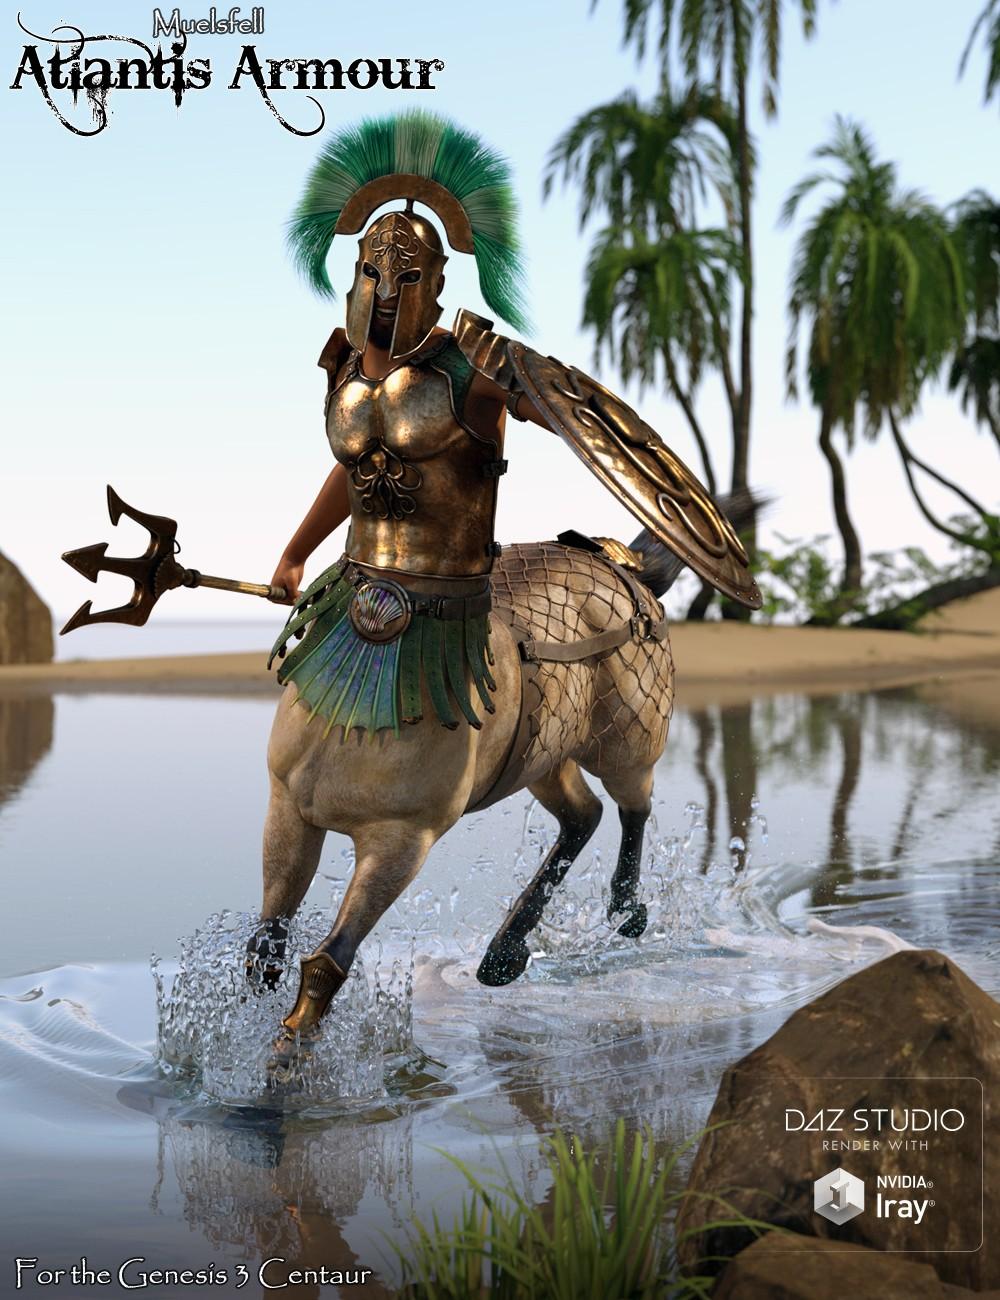 Muelsfell Atlantis Armour for the Centaur 7 Male